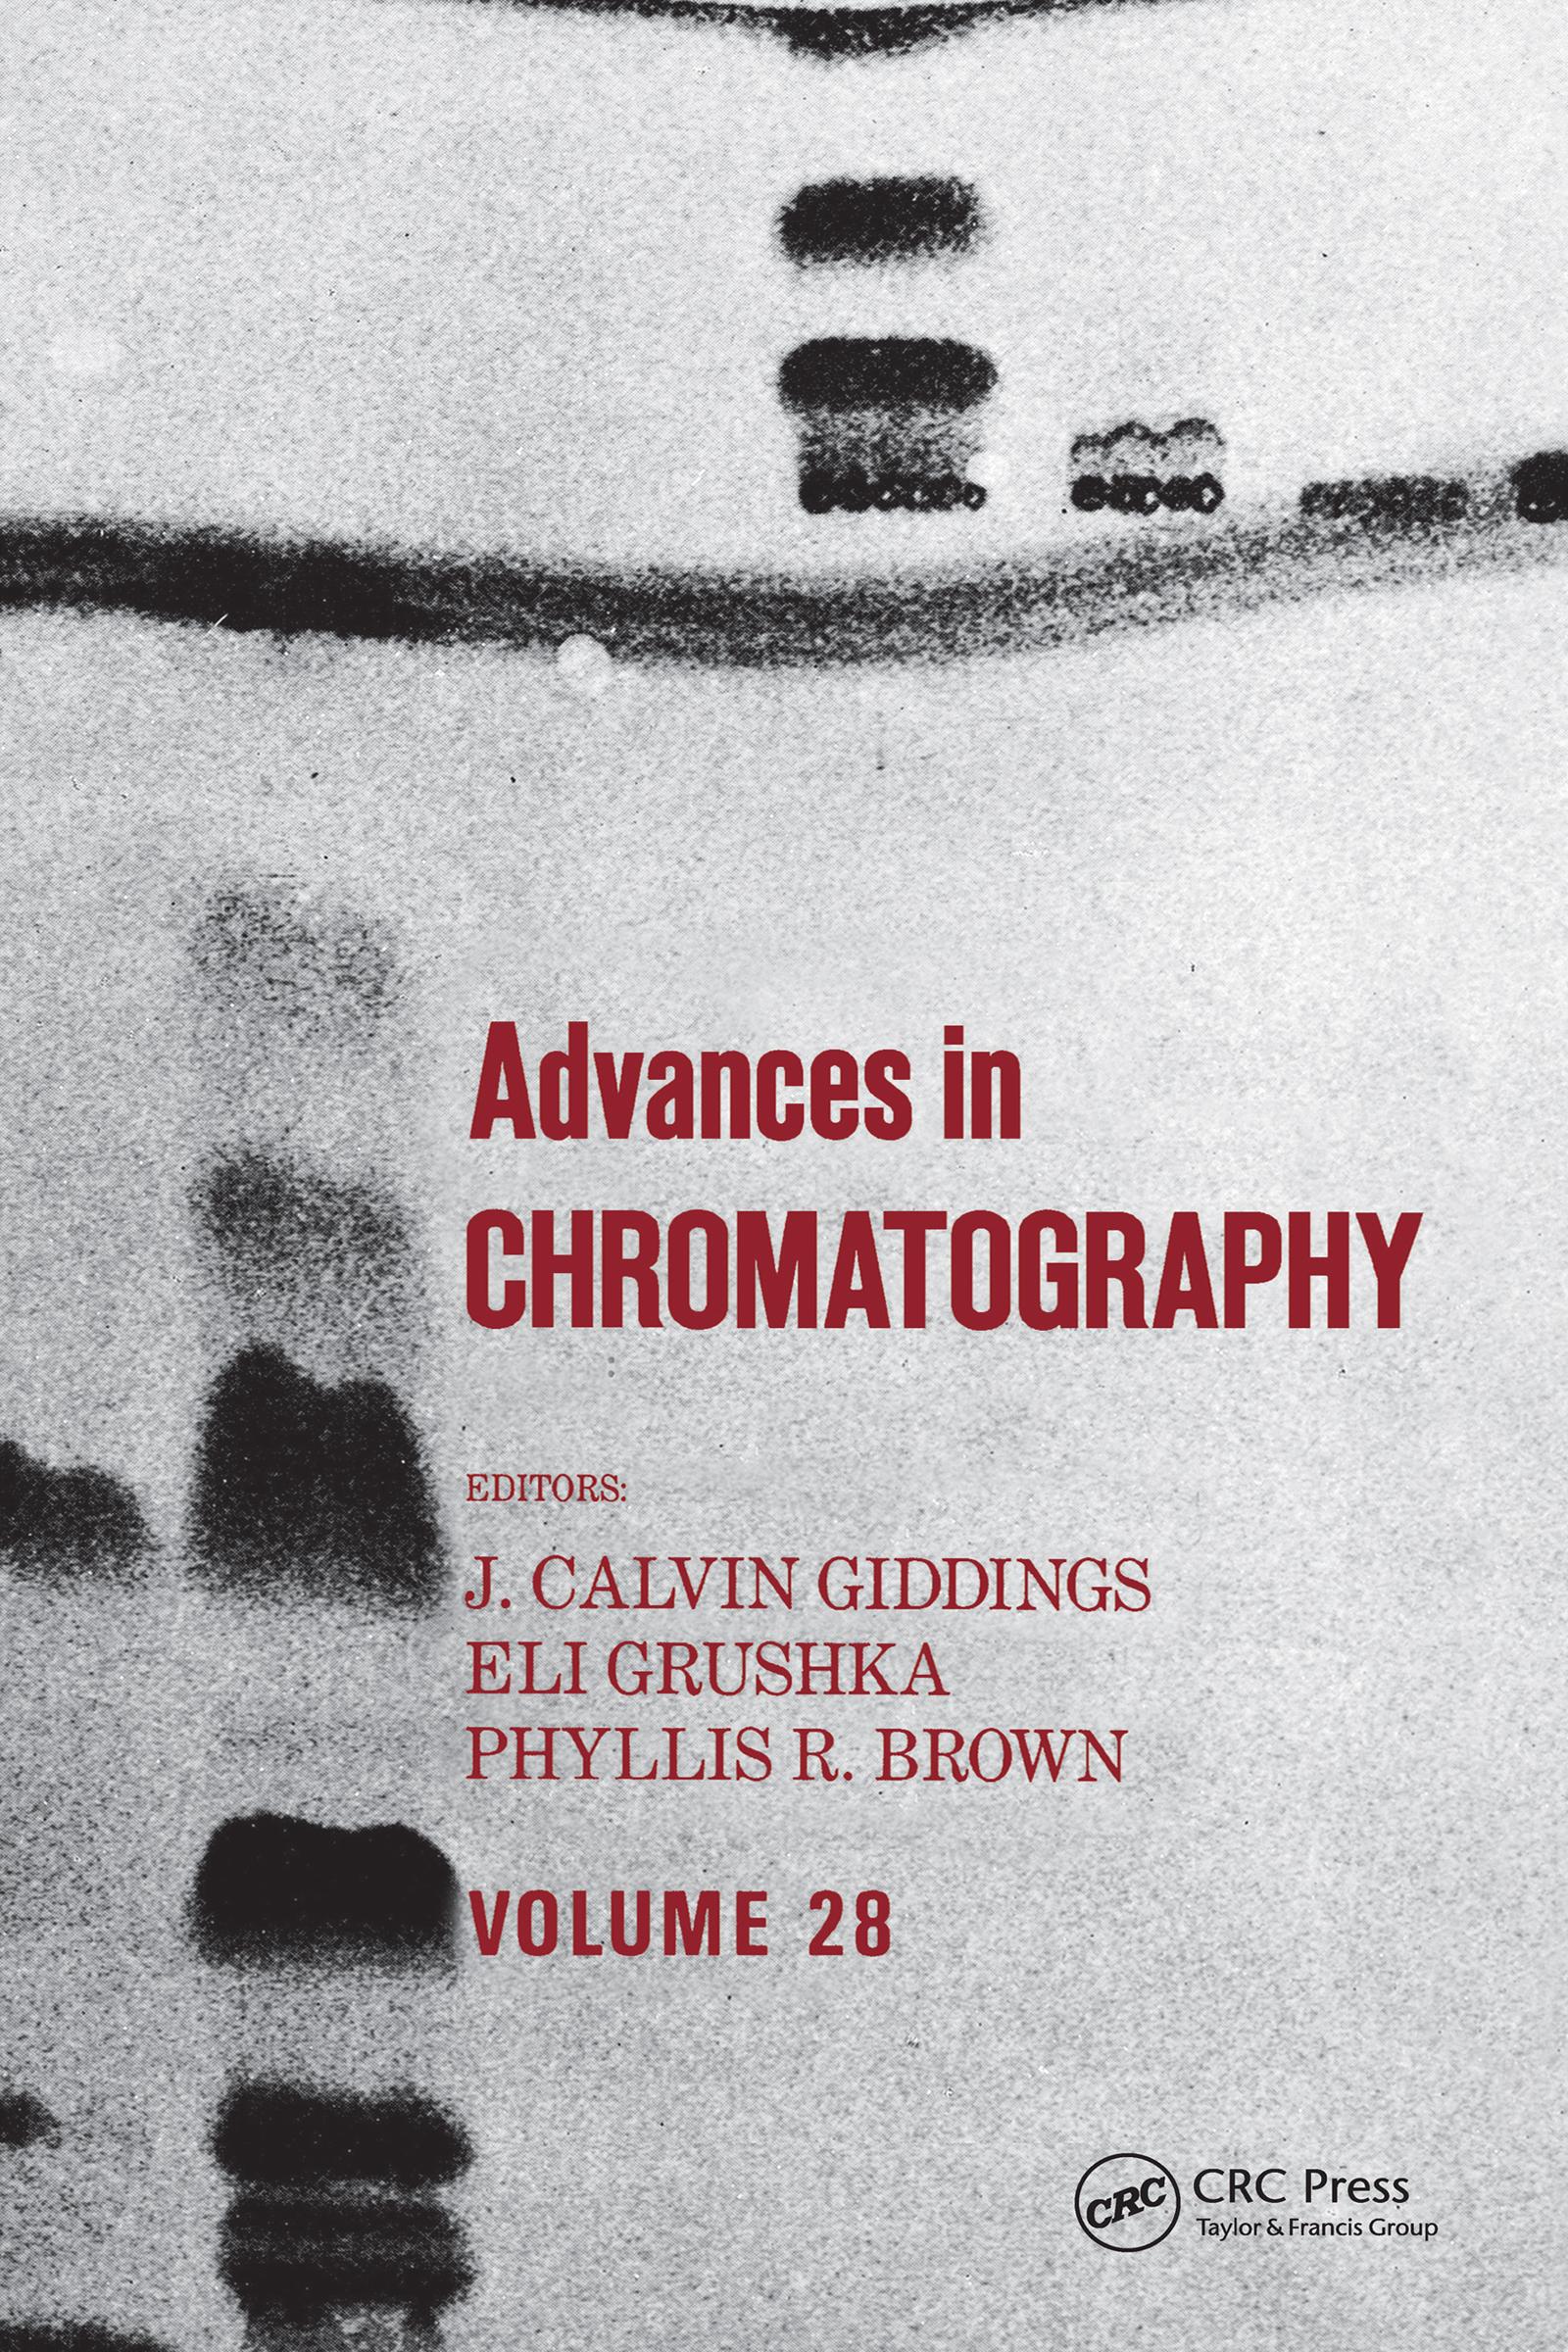 Advances in Chromatography: Volume 28 book cover